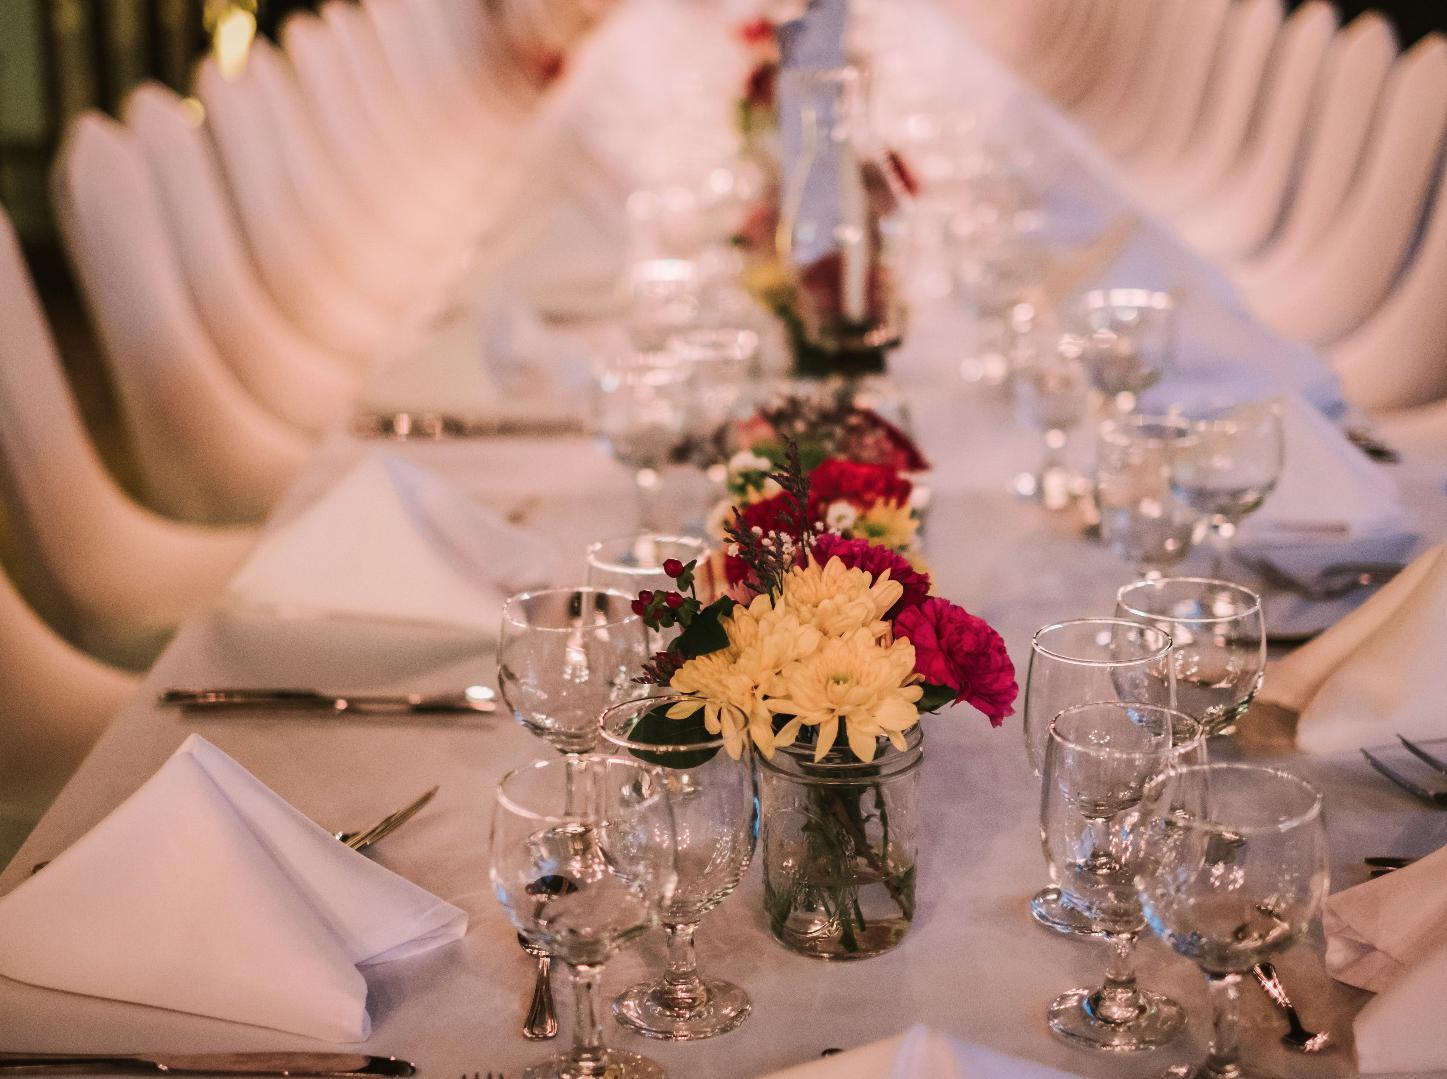 bodas-sin-clasificar-sin-tema-cuba-29371.jpg